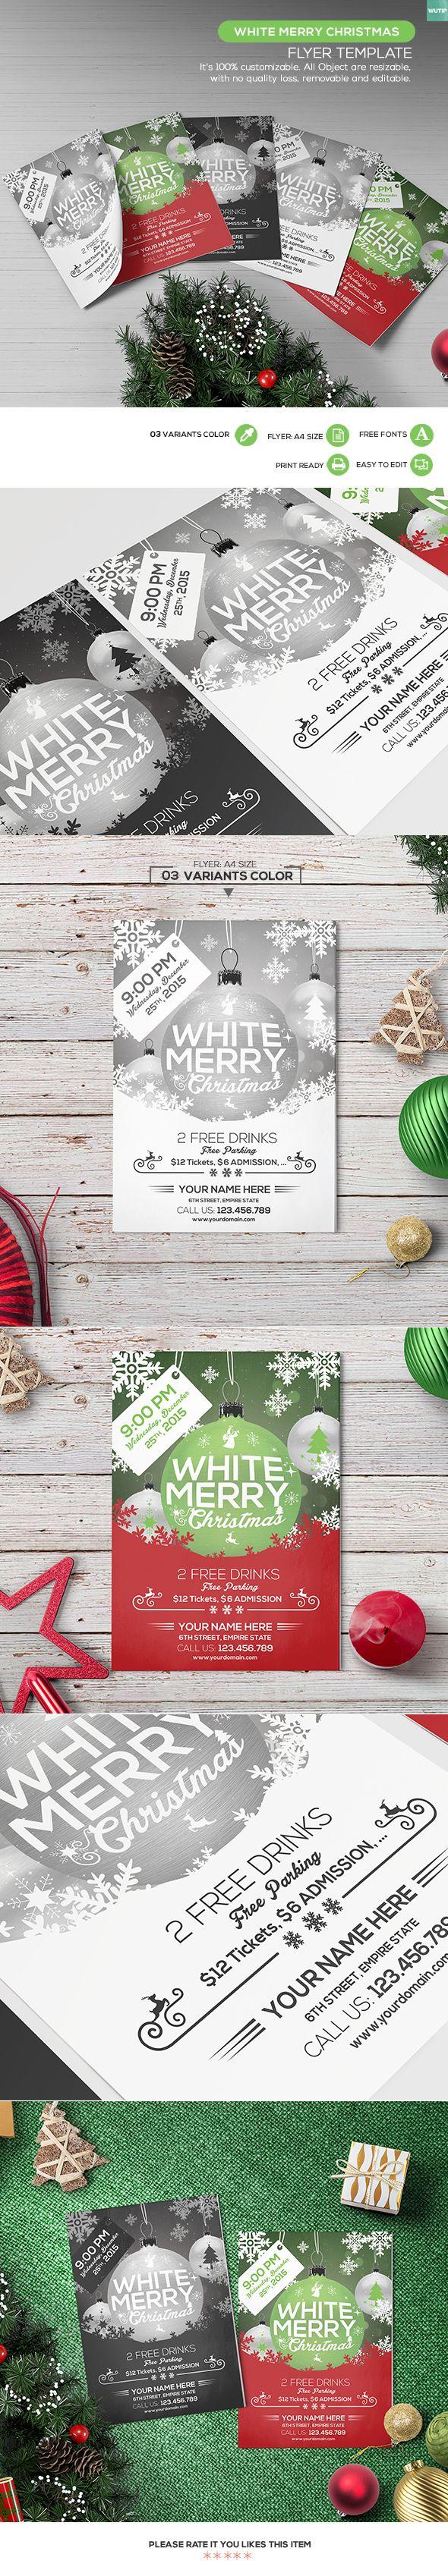 company christmas party invitation templates%0A FREE  u     Christmas Party Flyer Template on Behance